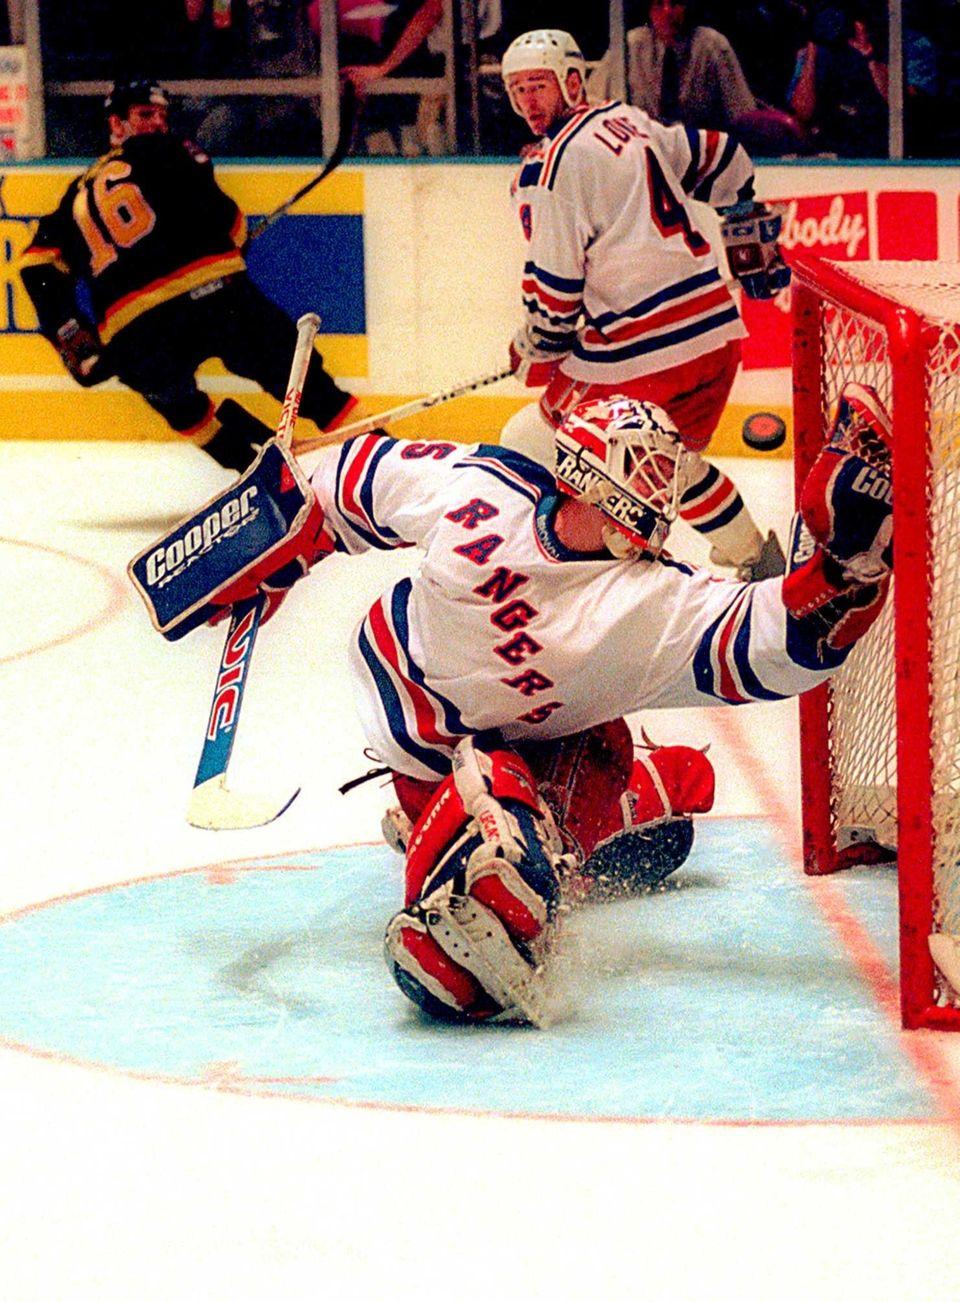 New York Rangers goalie Mike Richter makes a